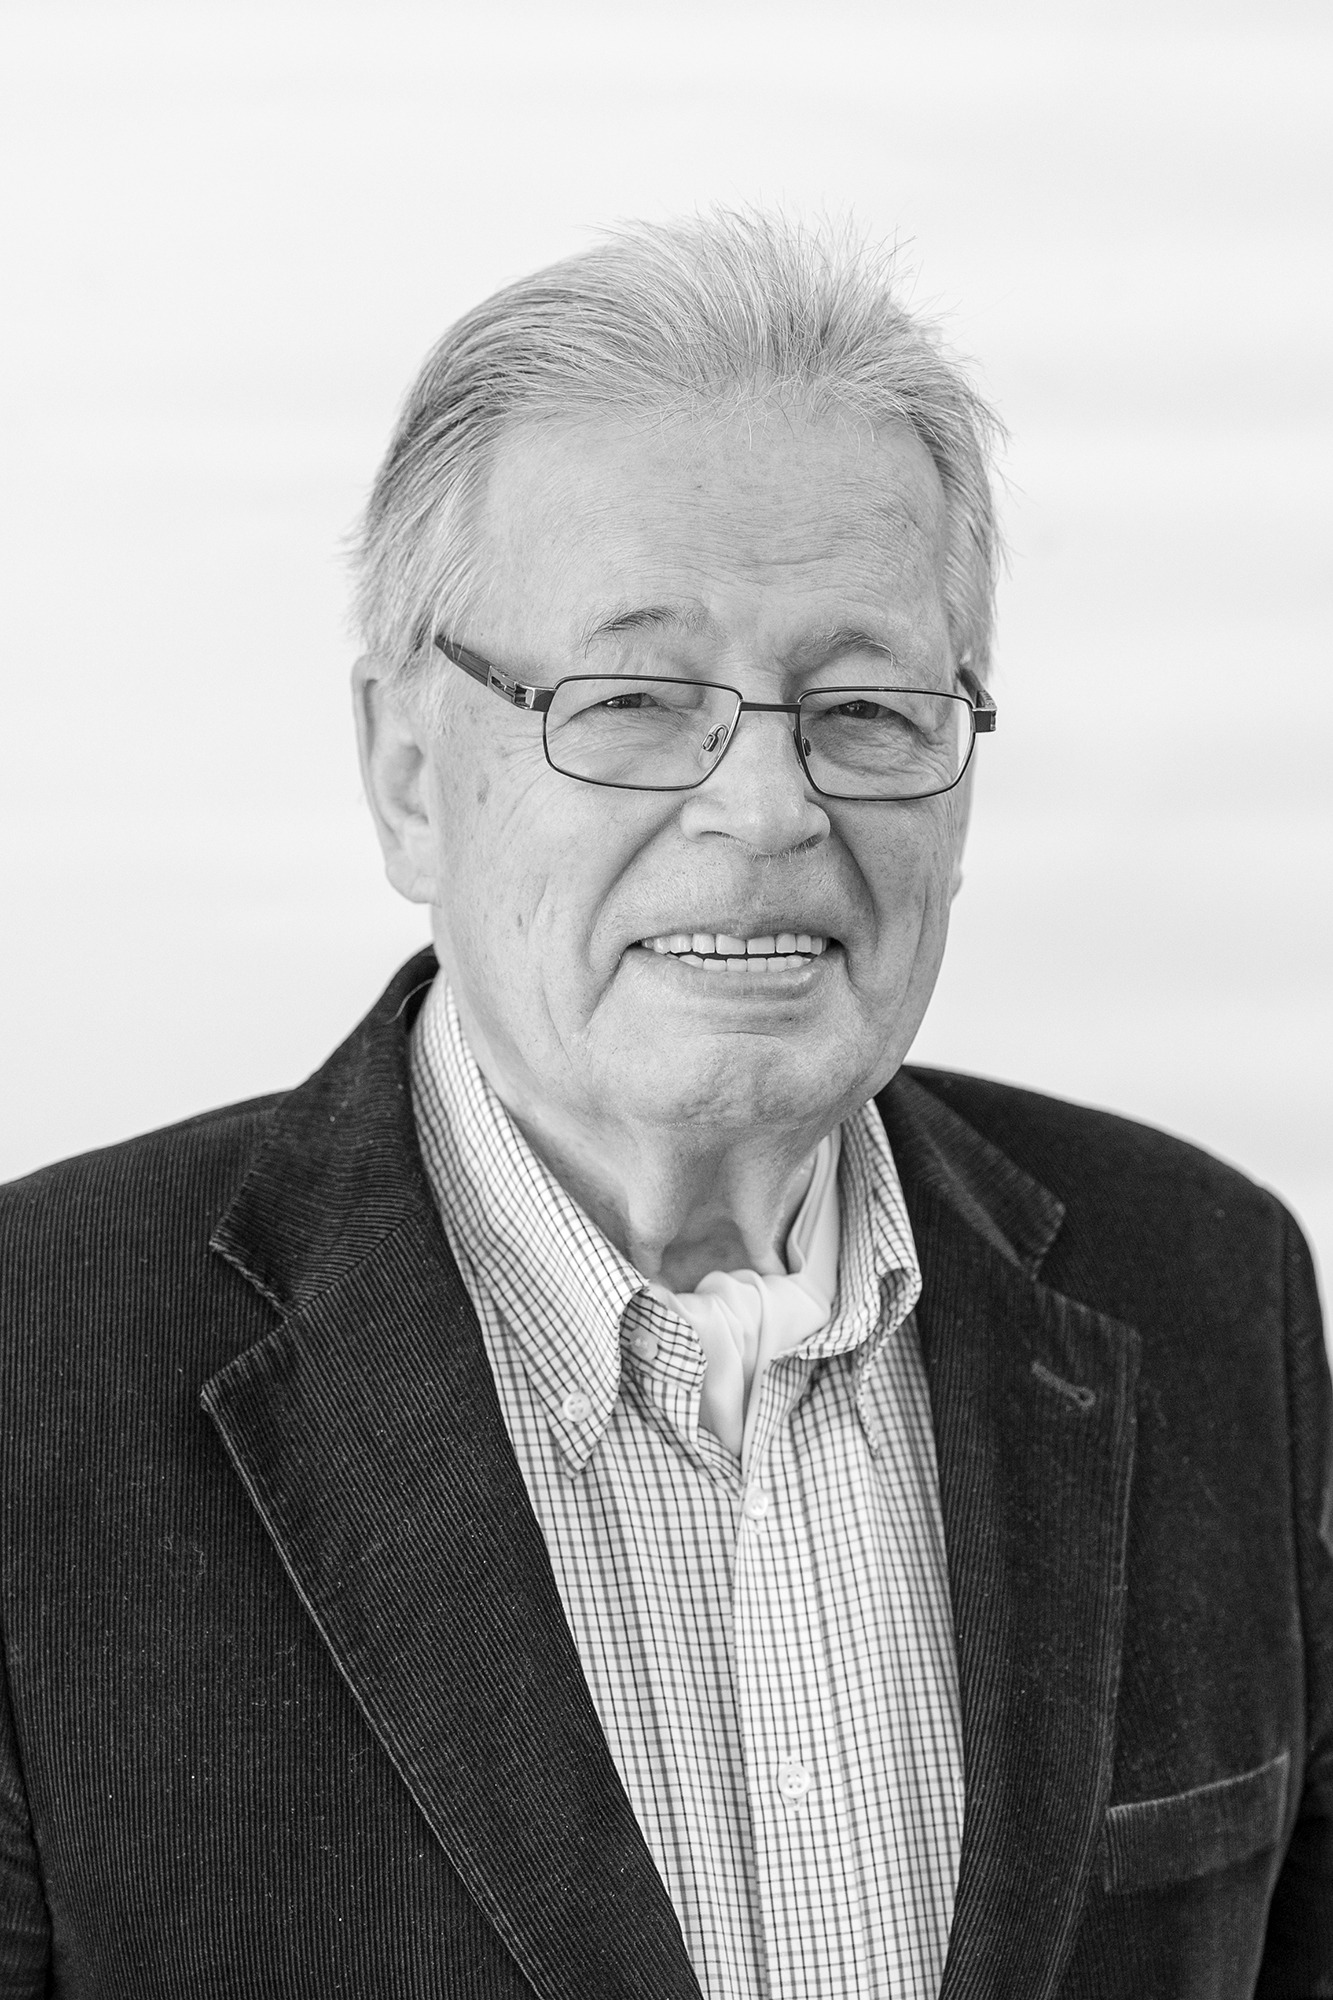 Kurt Stopper